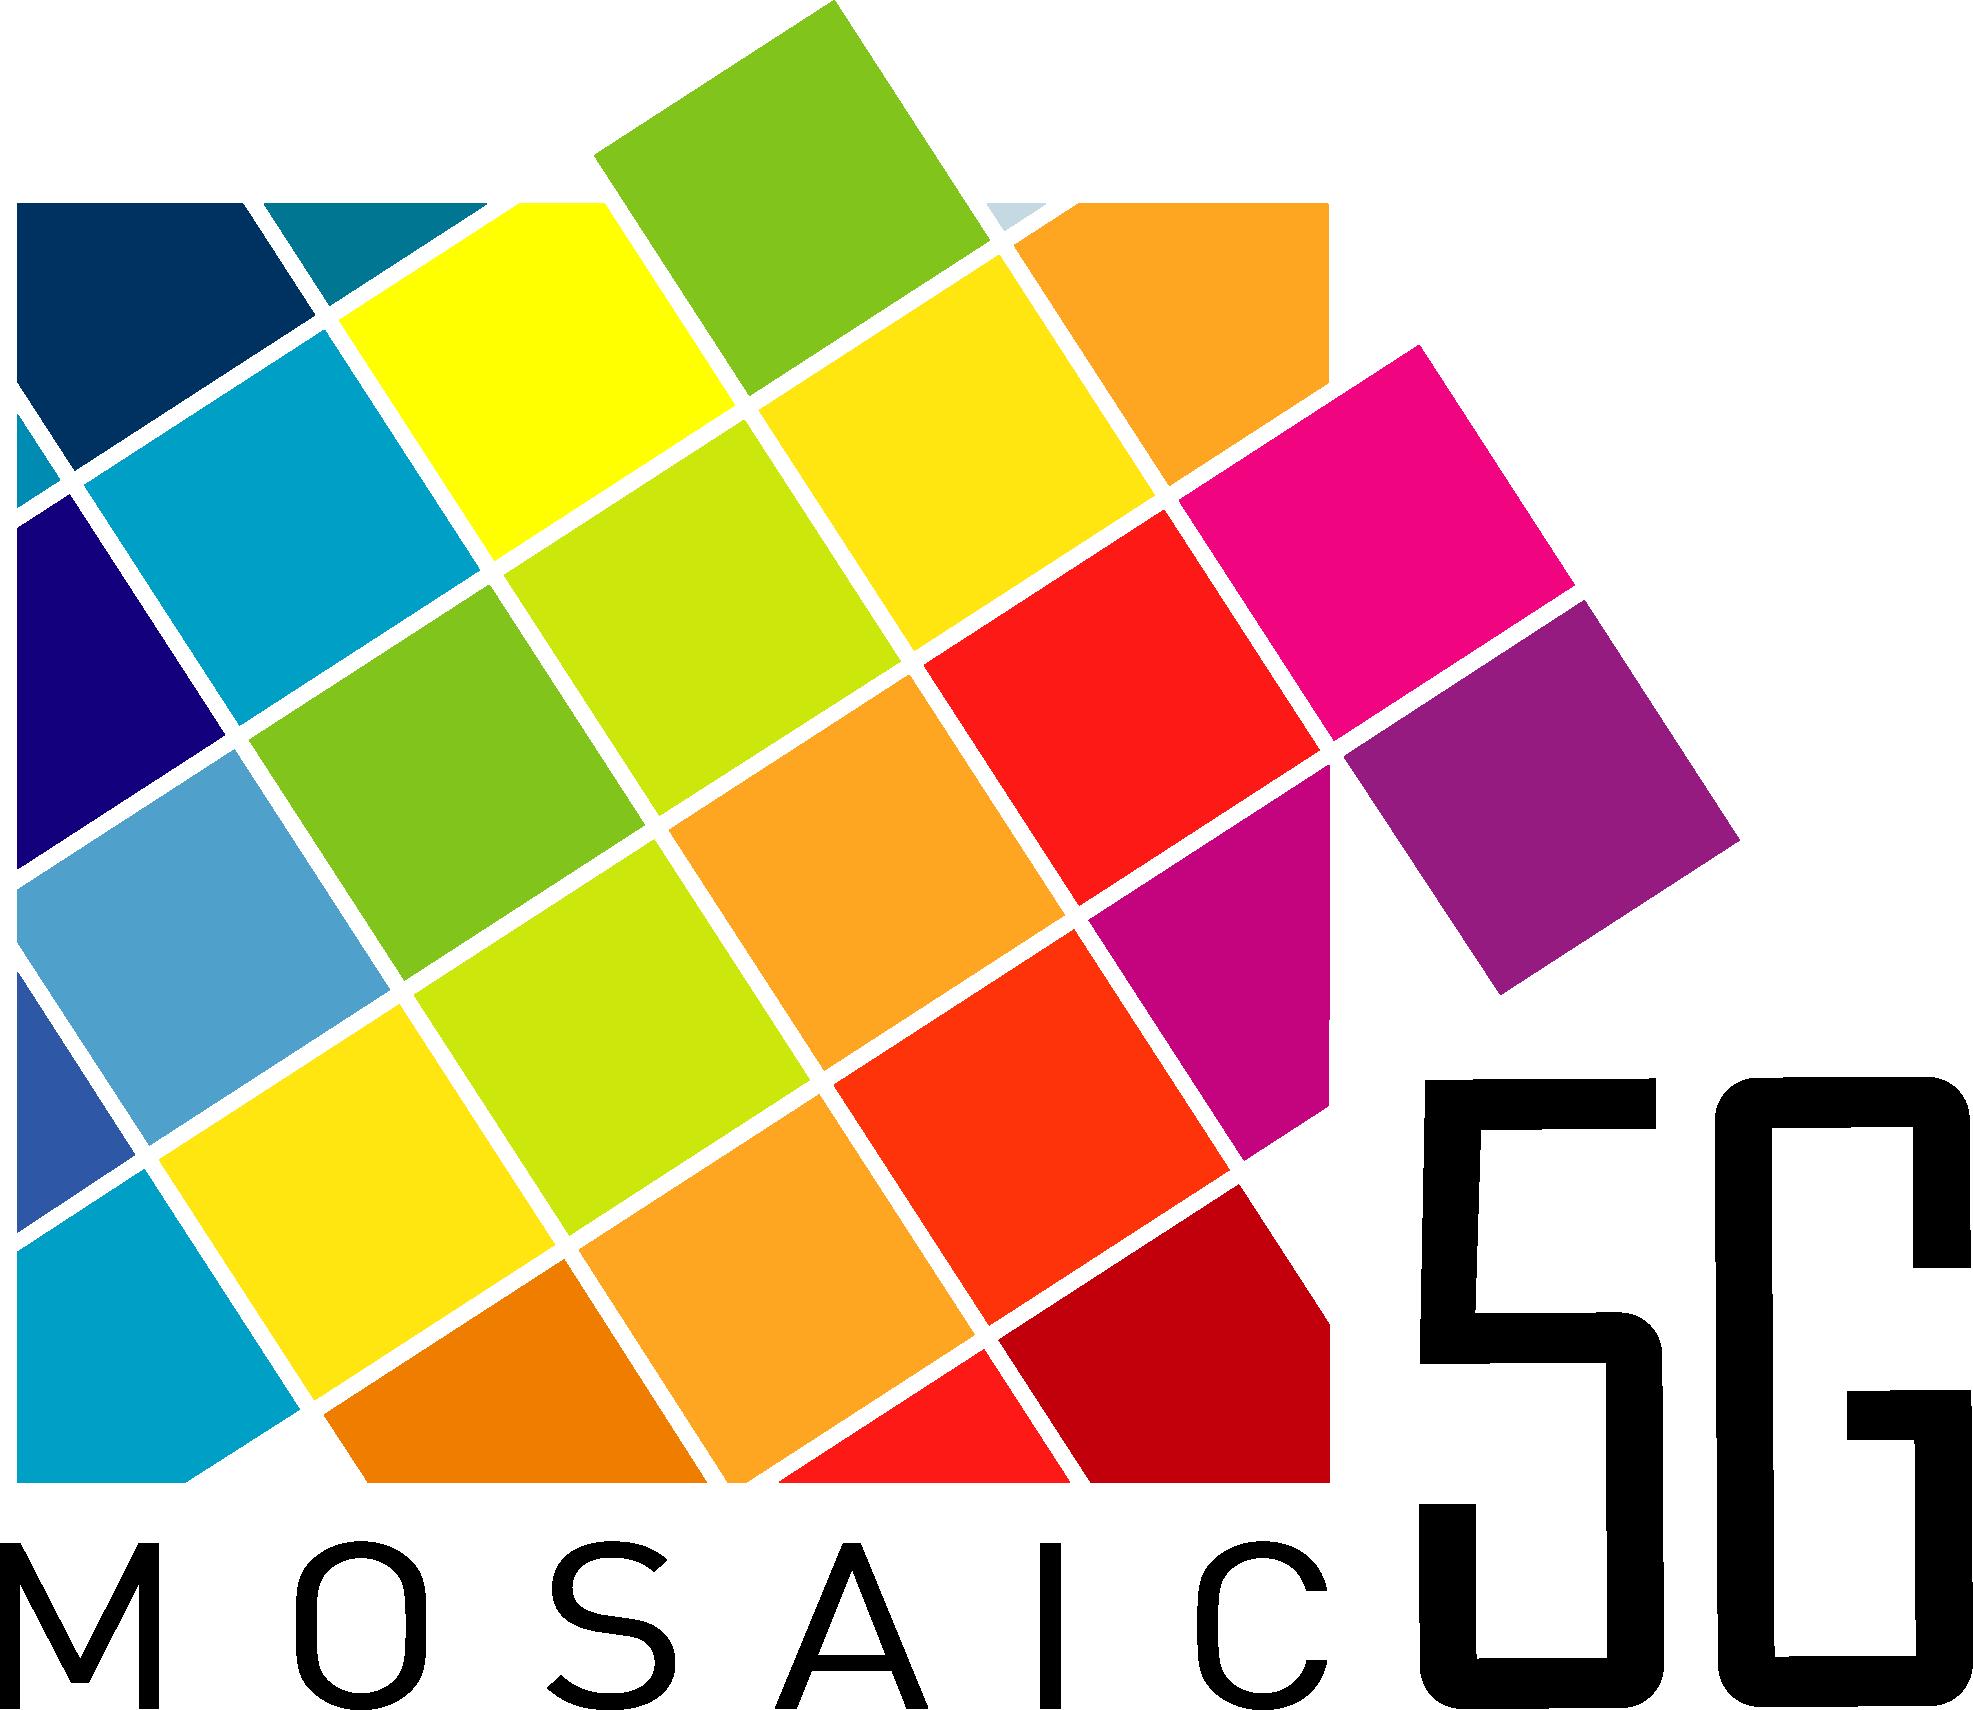 Mosaic5G